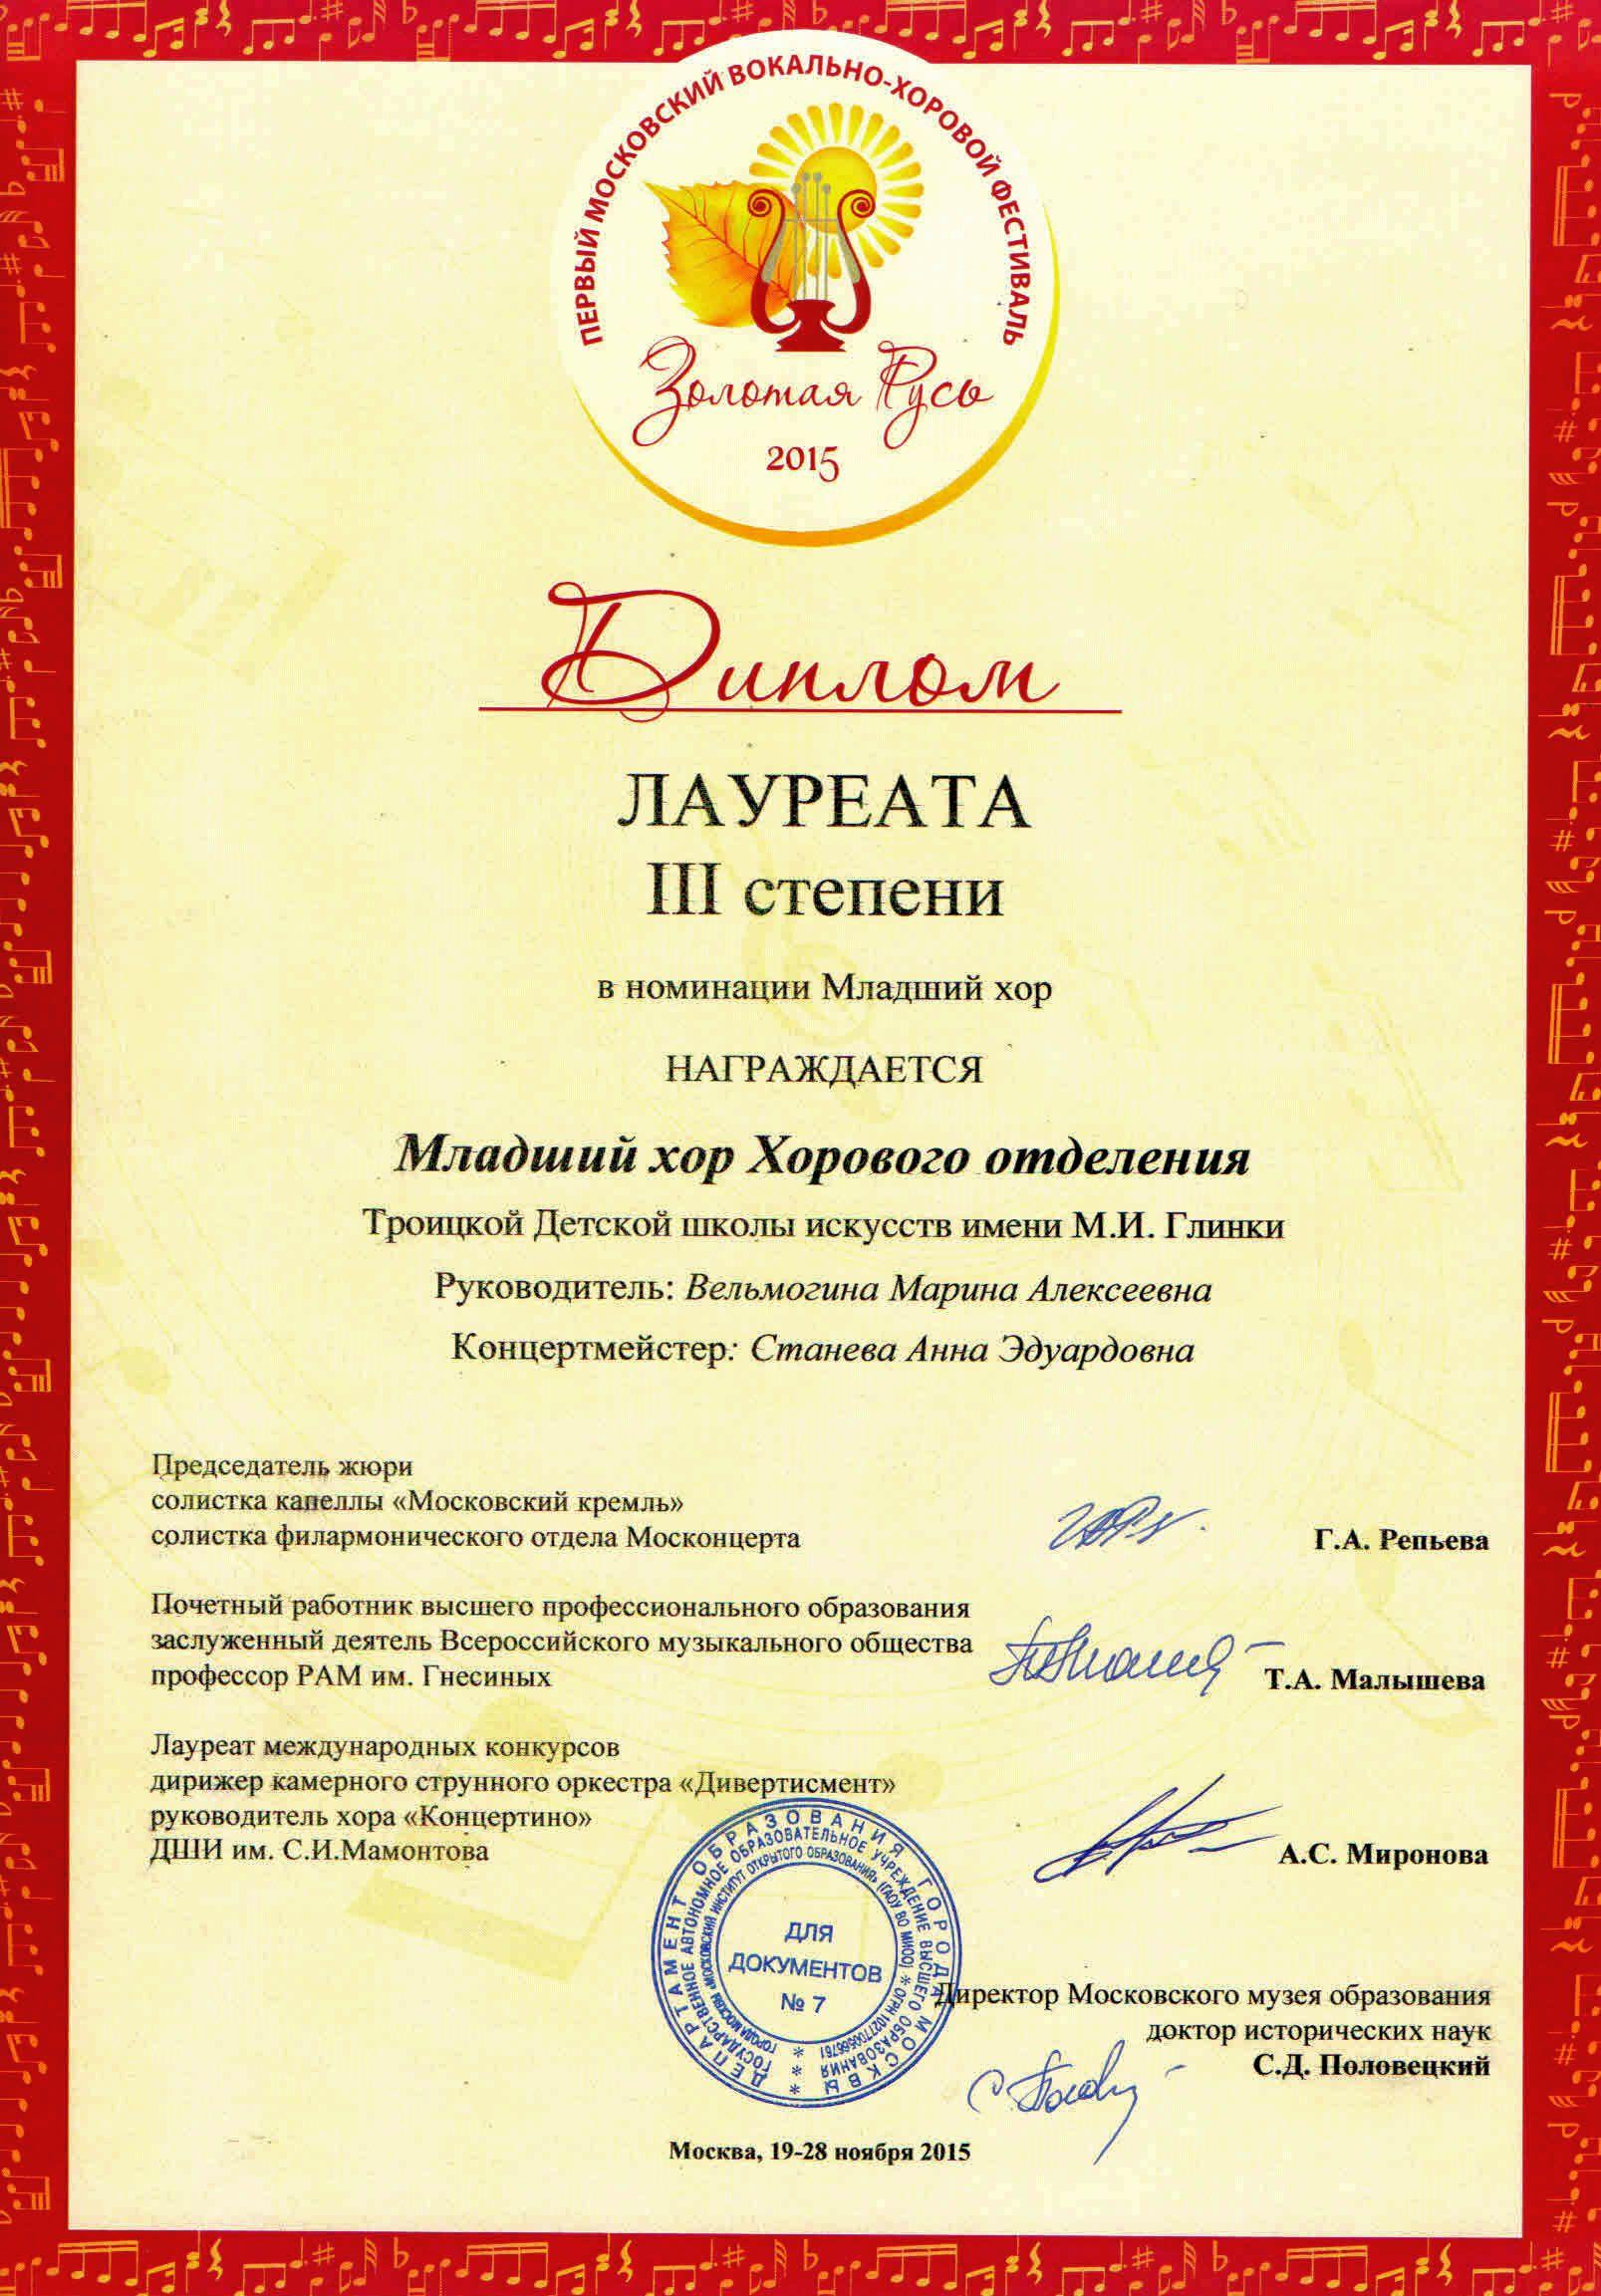 Diplom_Zolotaya_Rus